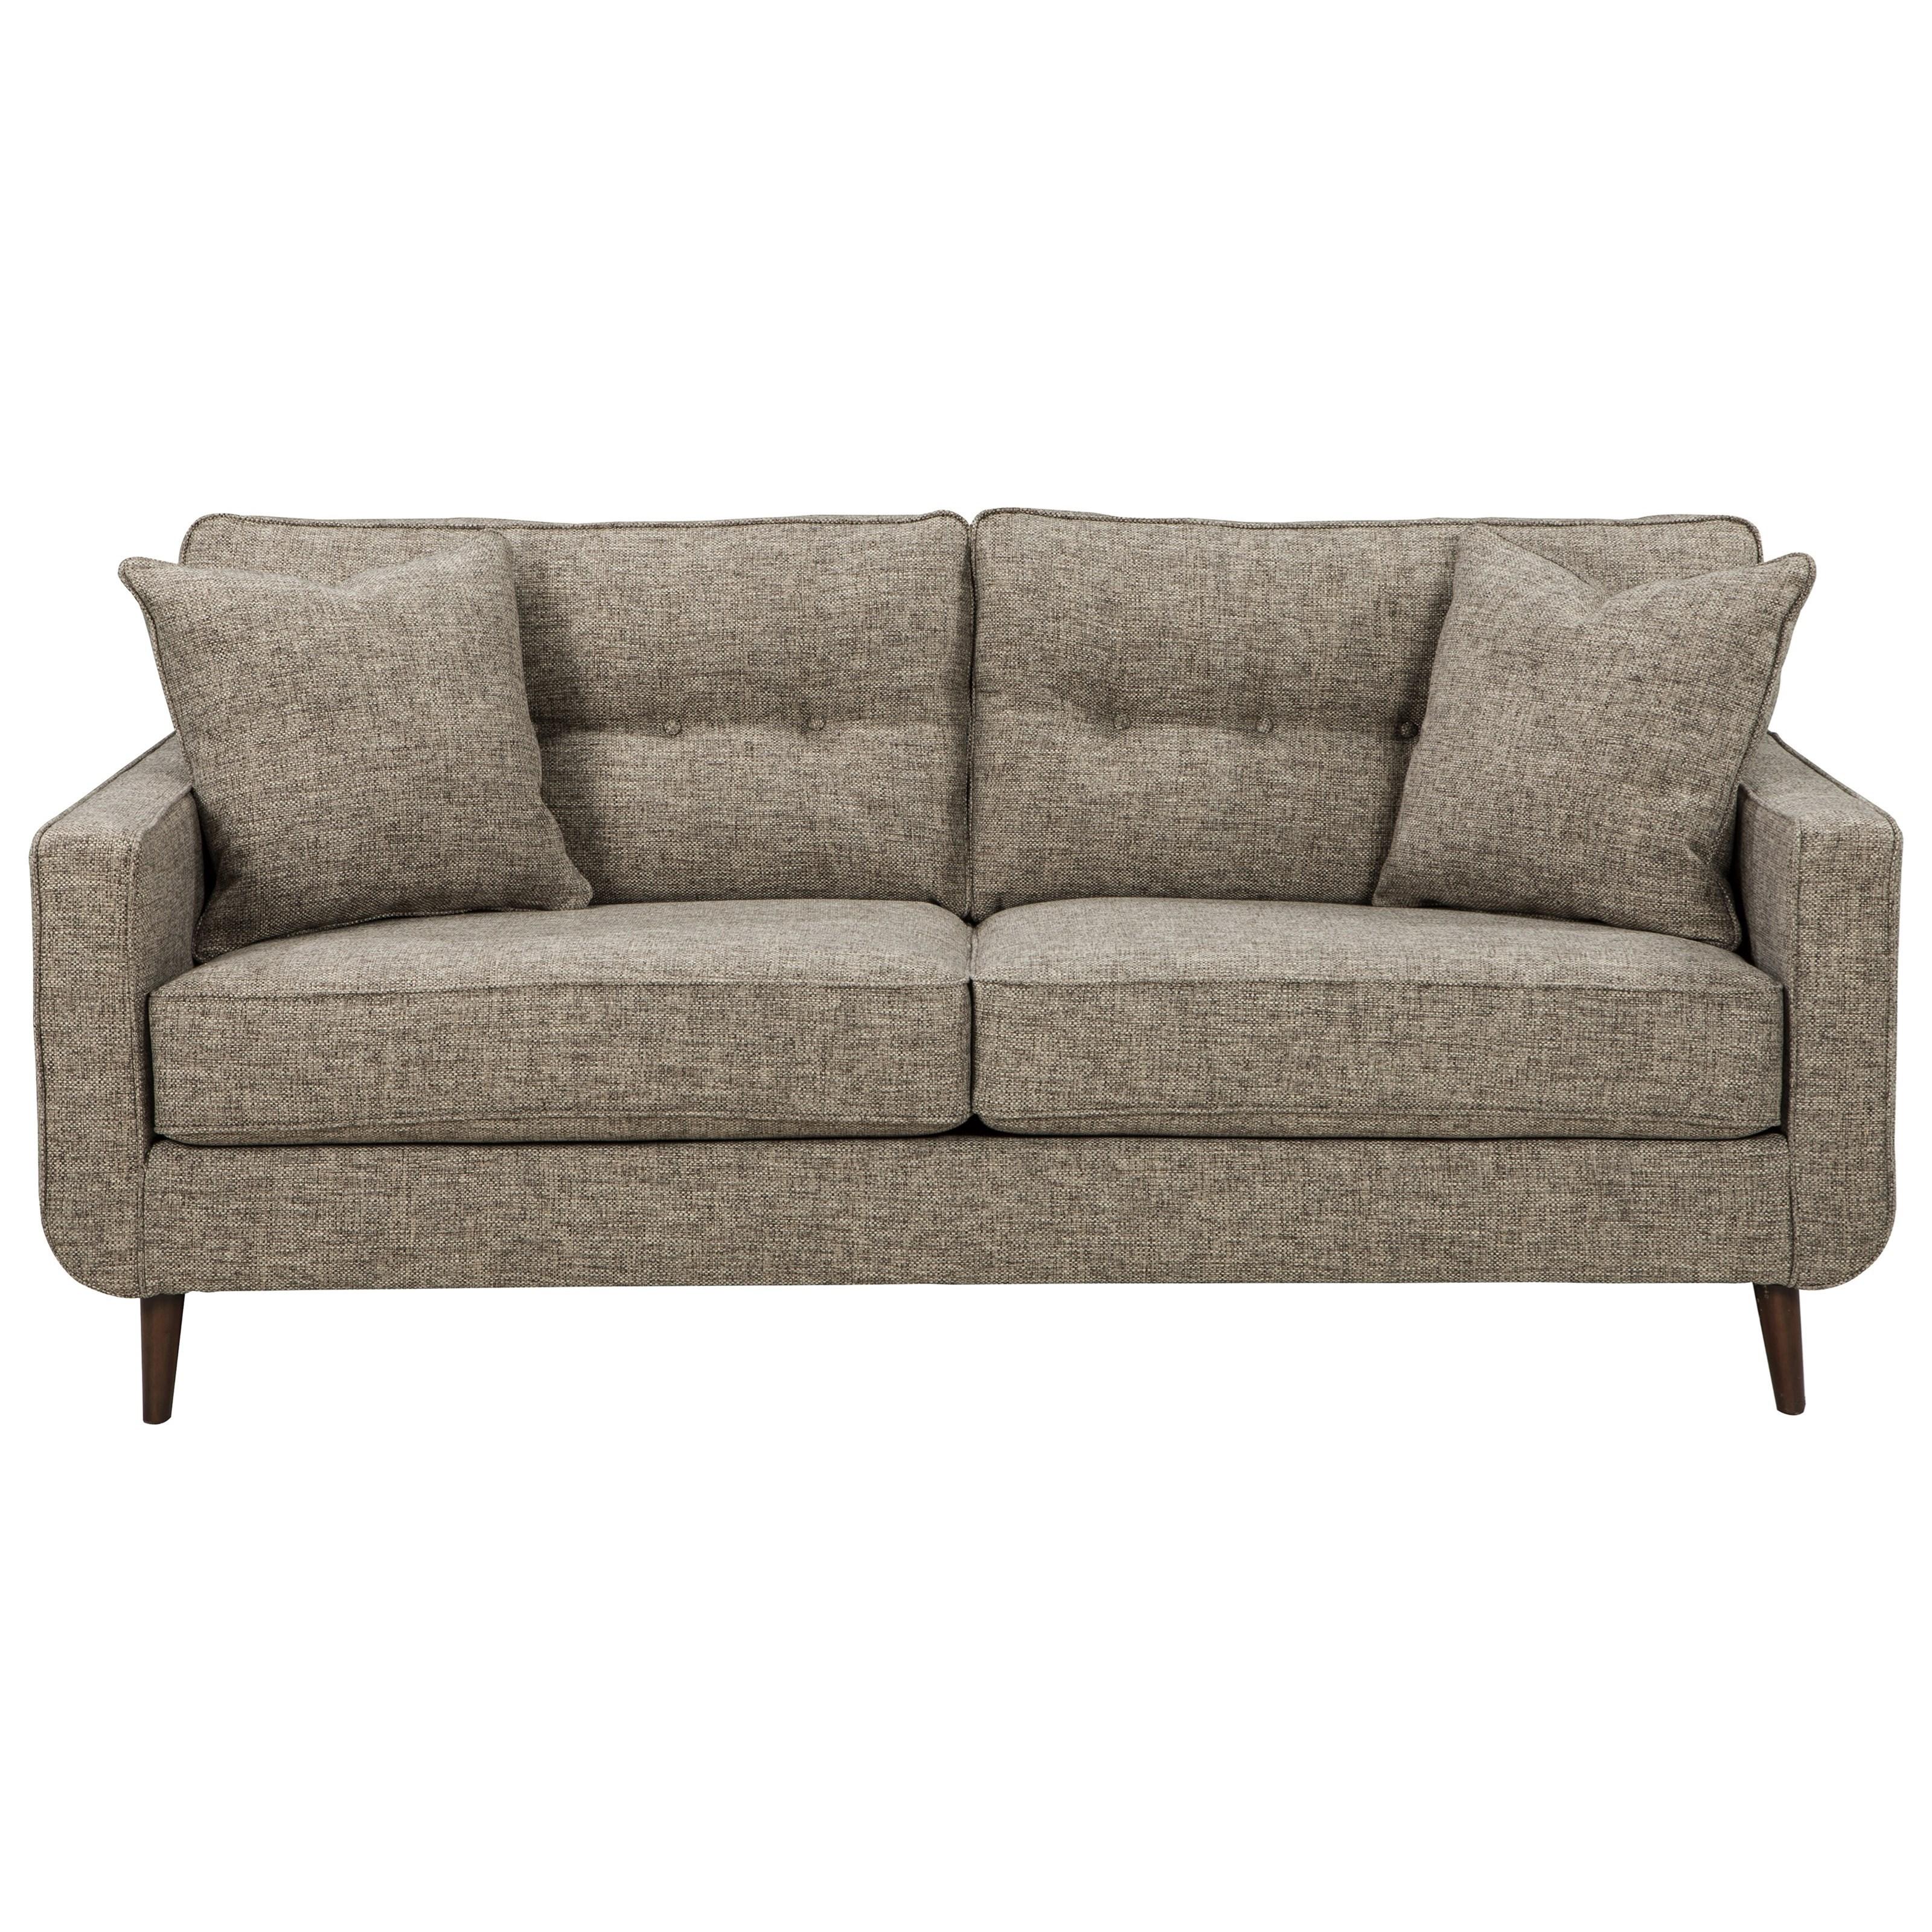 Benchcraft Della Mid Century Modern Sofa Walker S Furniture Sofas